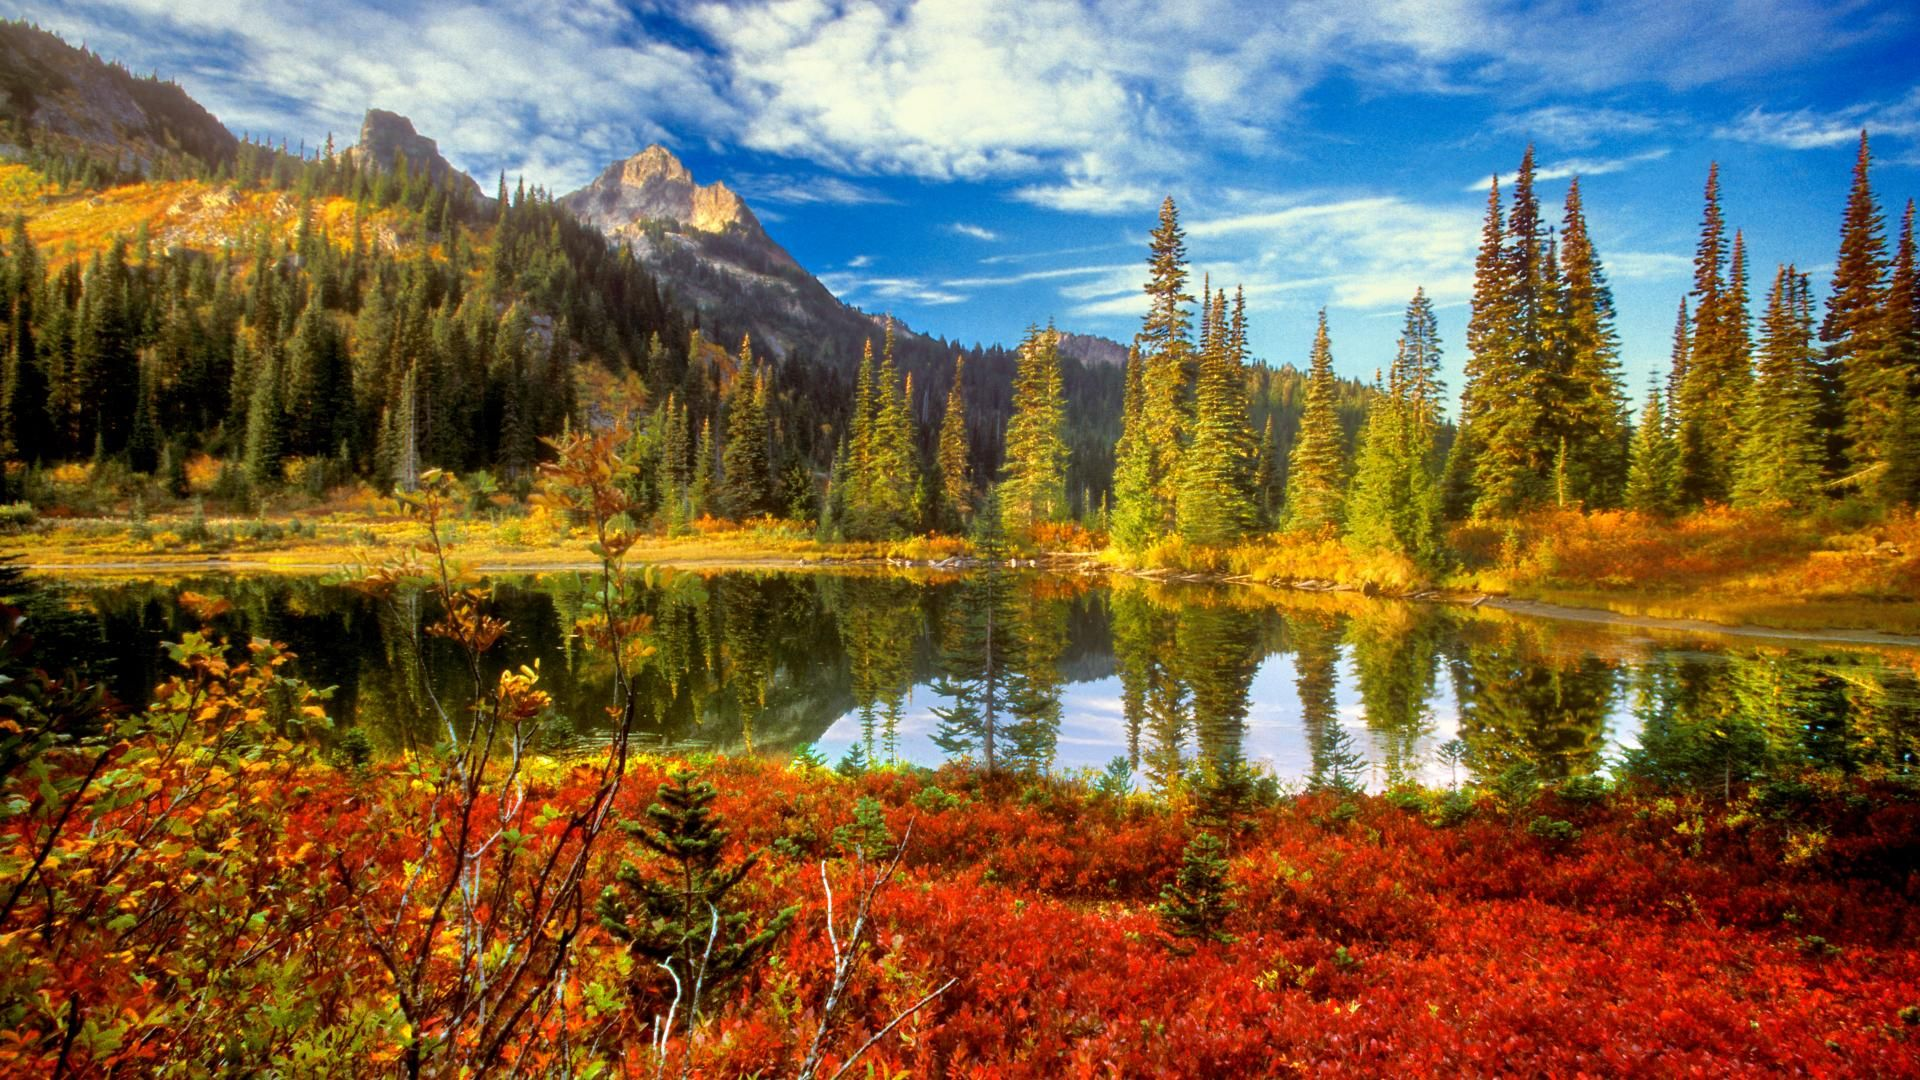 fall photos   Fall in the Tatoosh Wilderness Mount Rainier National Park Washington ...